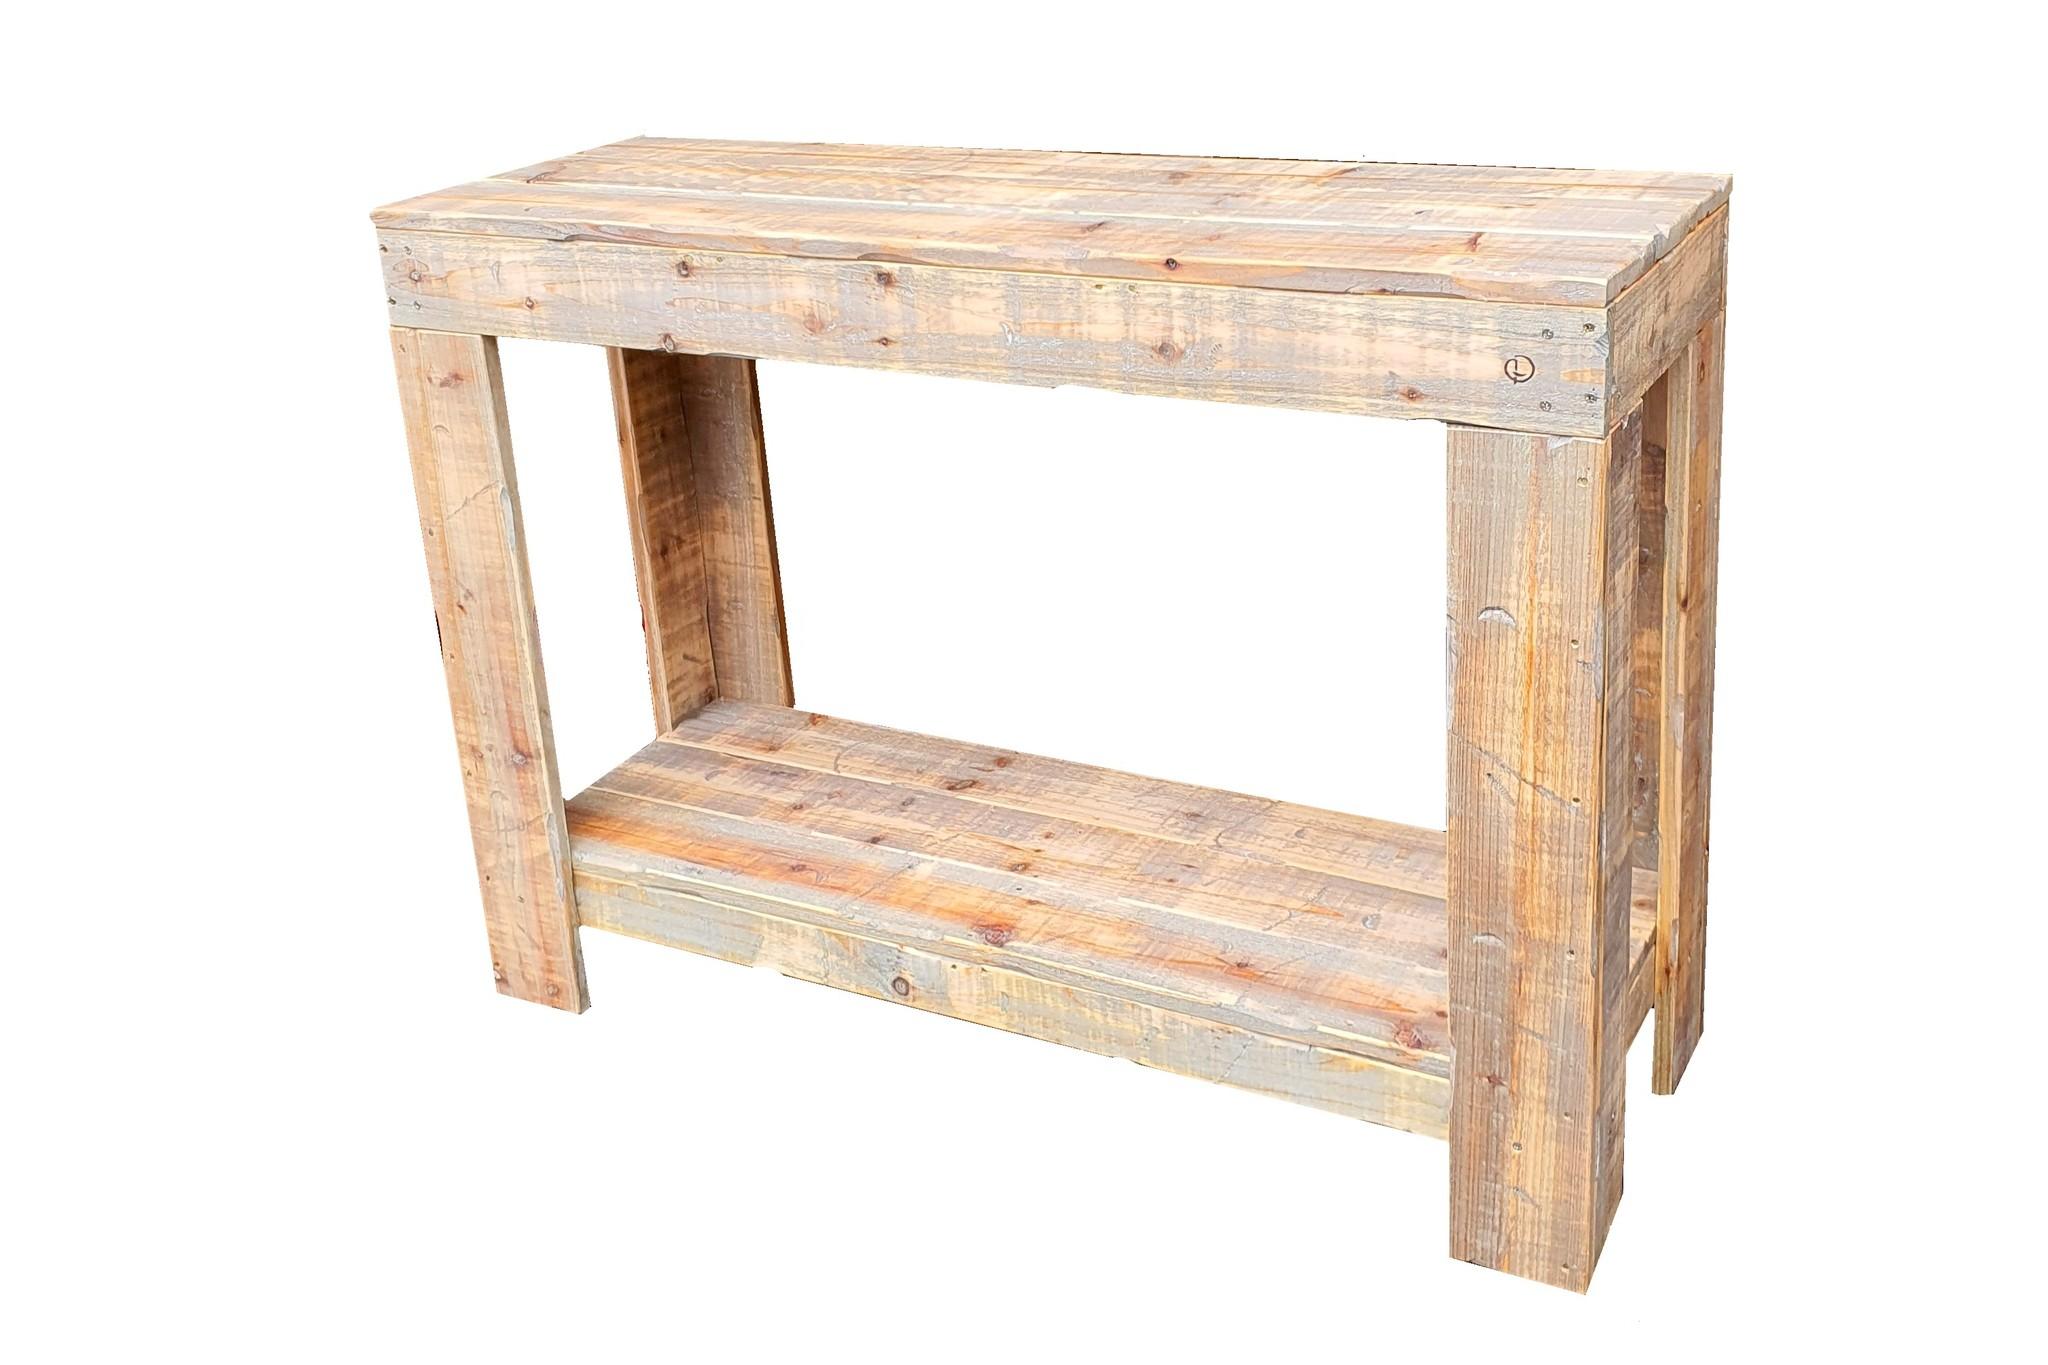 shop int dutch dark table double 110/39-2